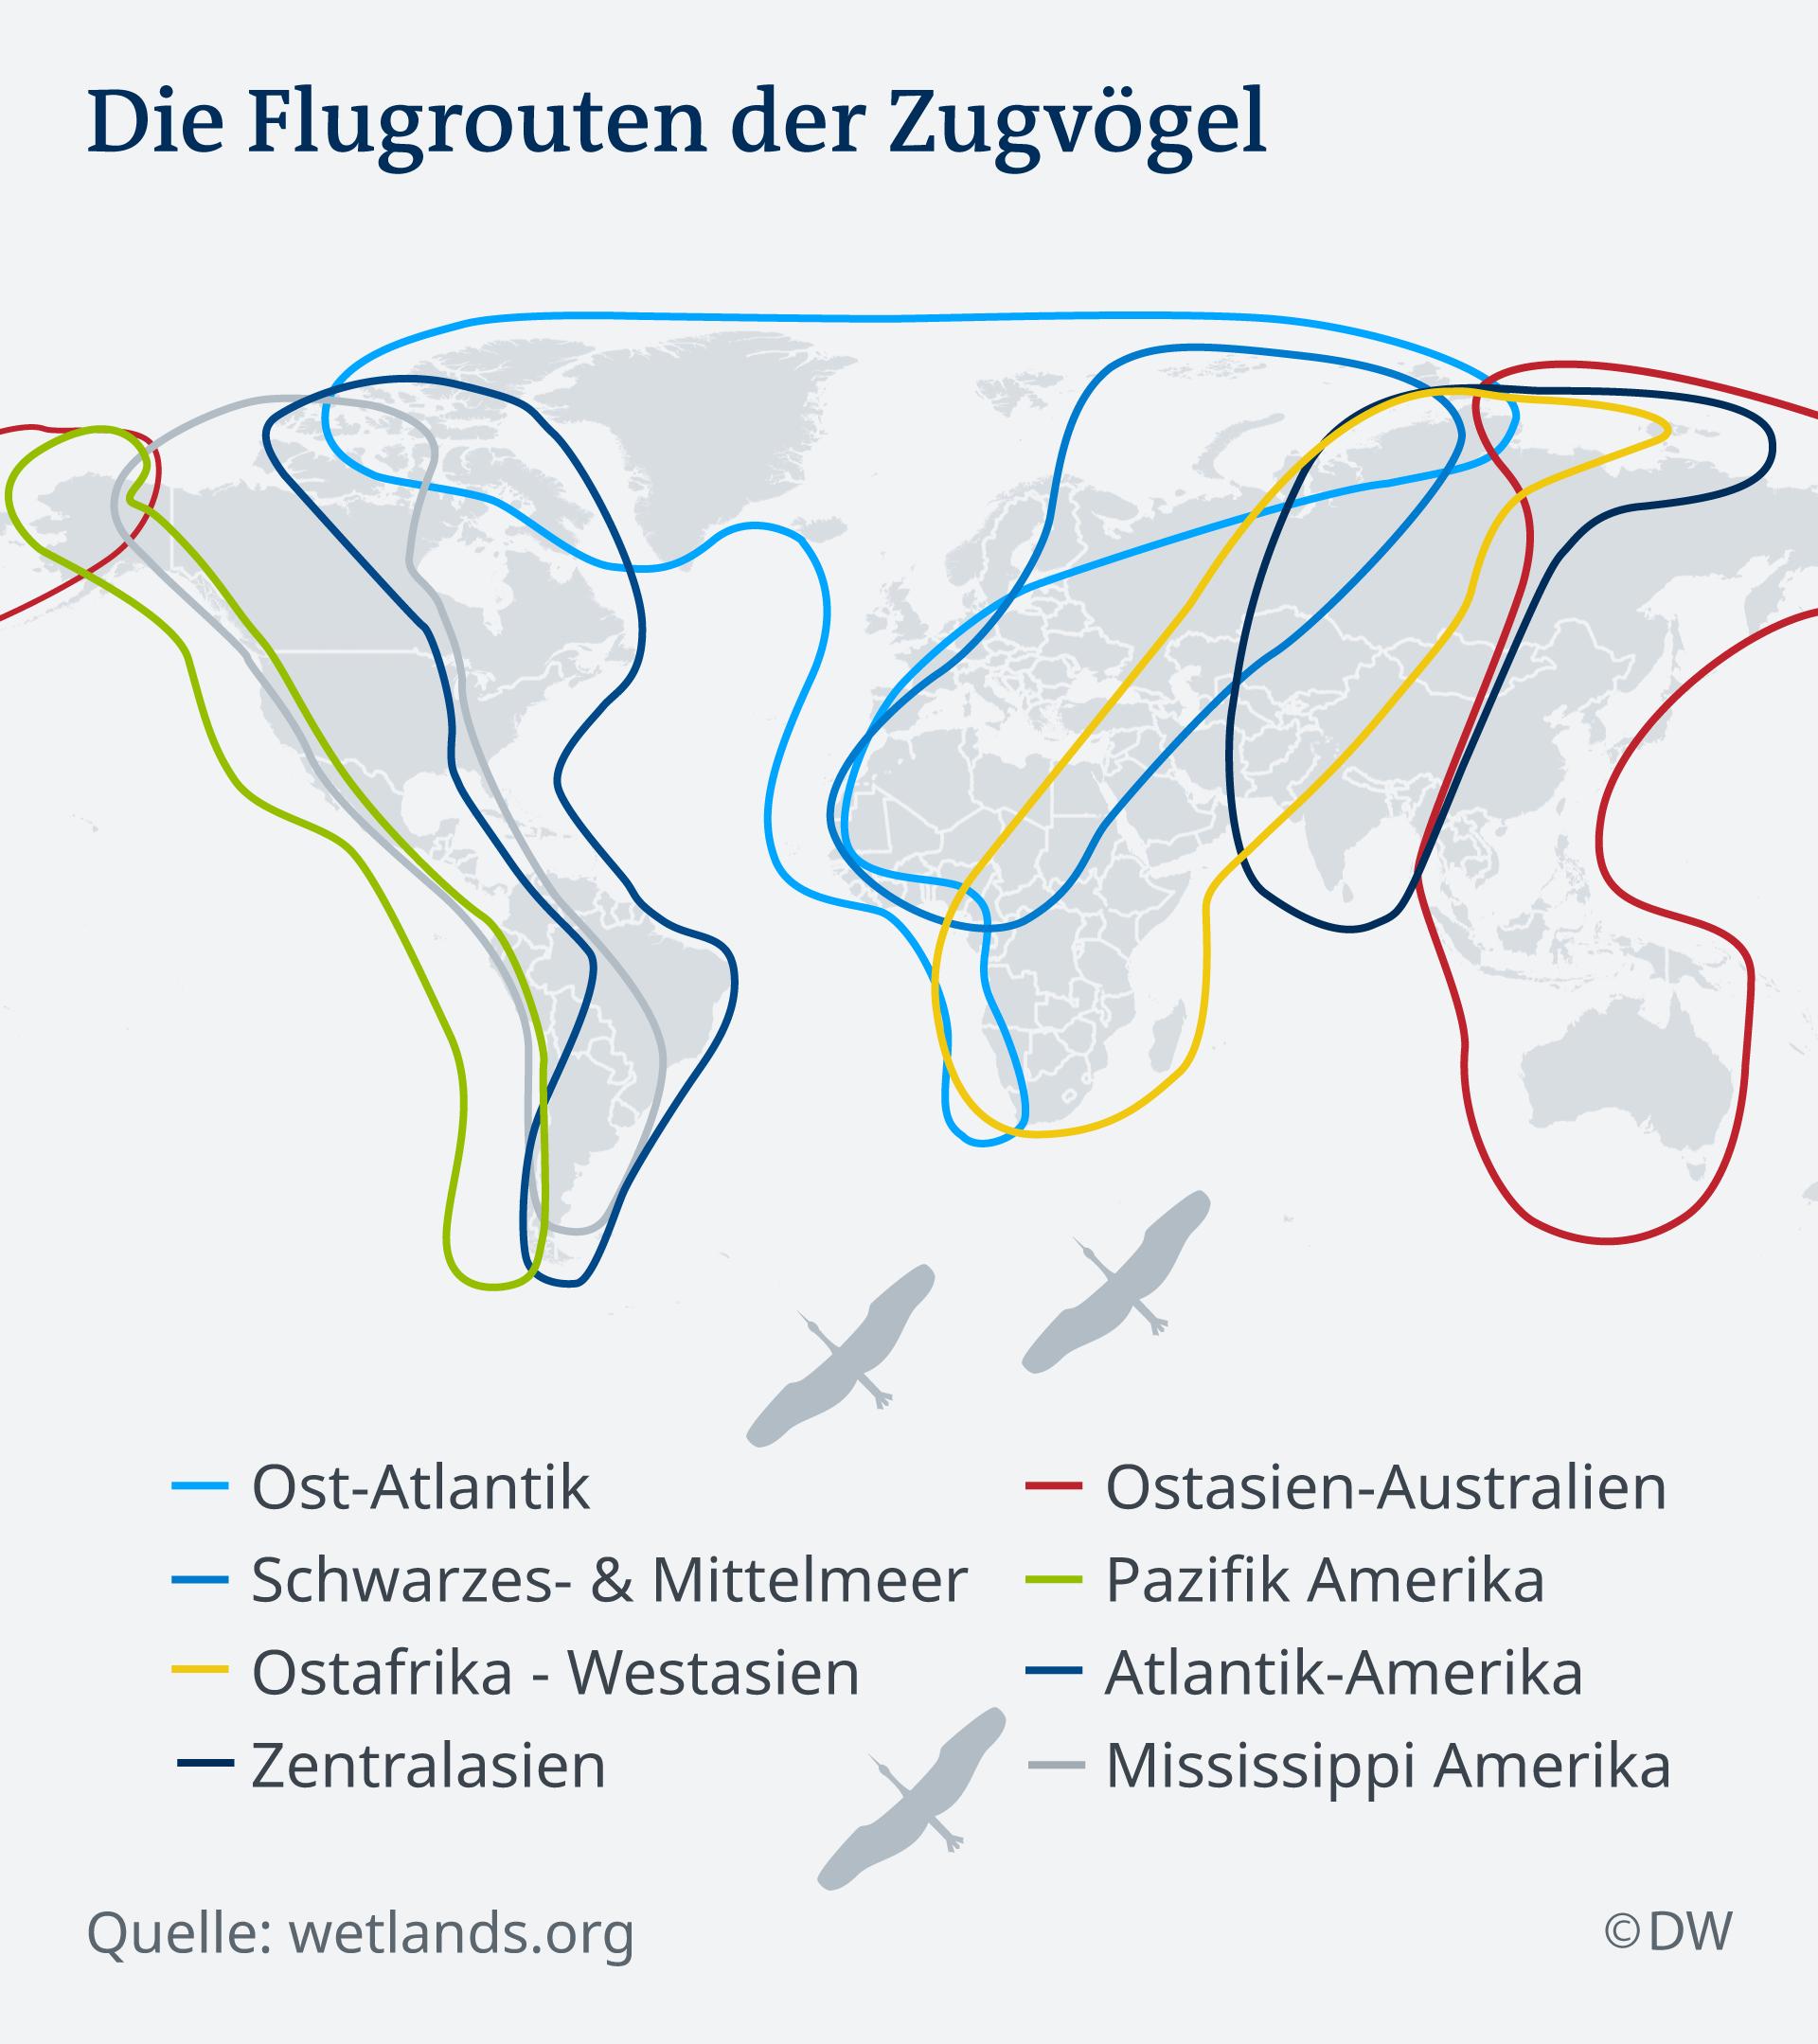 Grafik zu den Flugrouten der Zugvögel